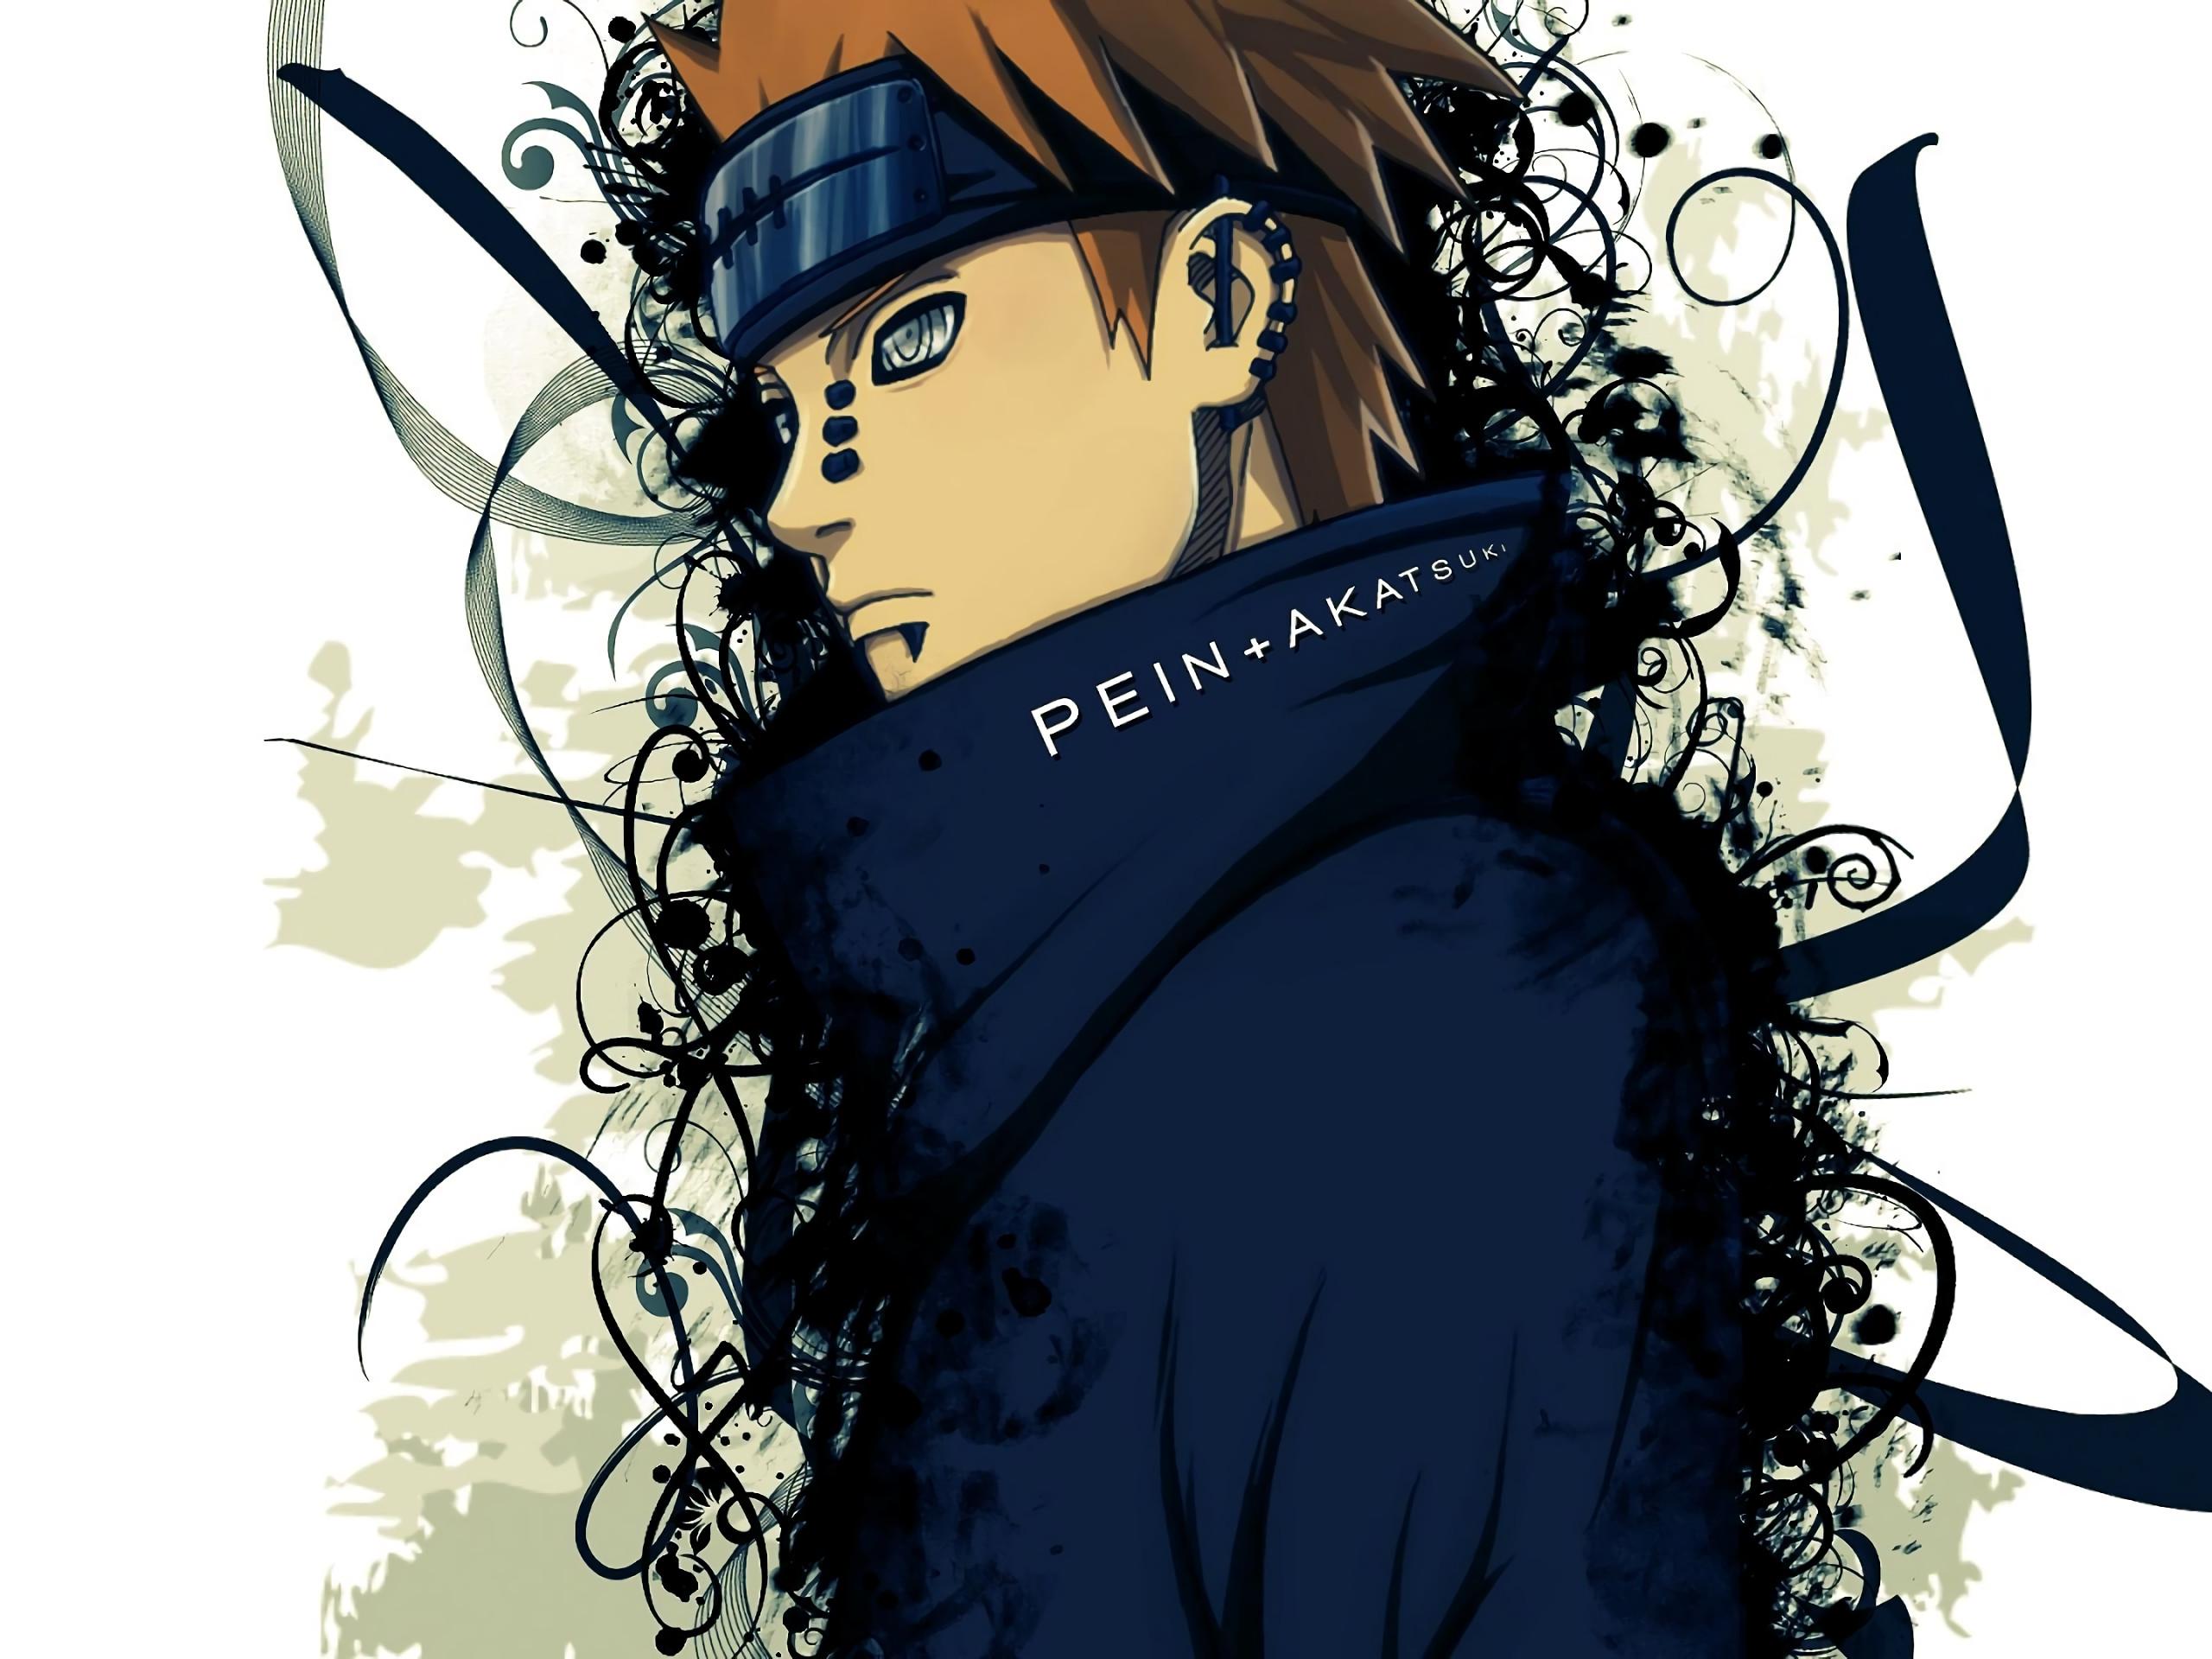 Pain Naruto Wallpapers ID: MNL924924